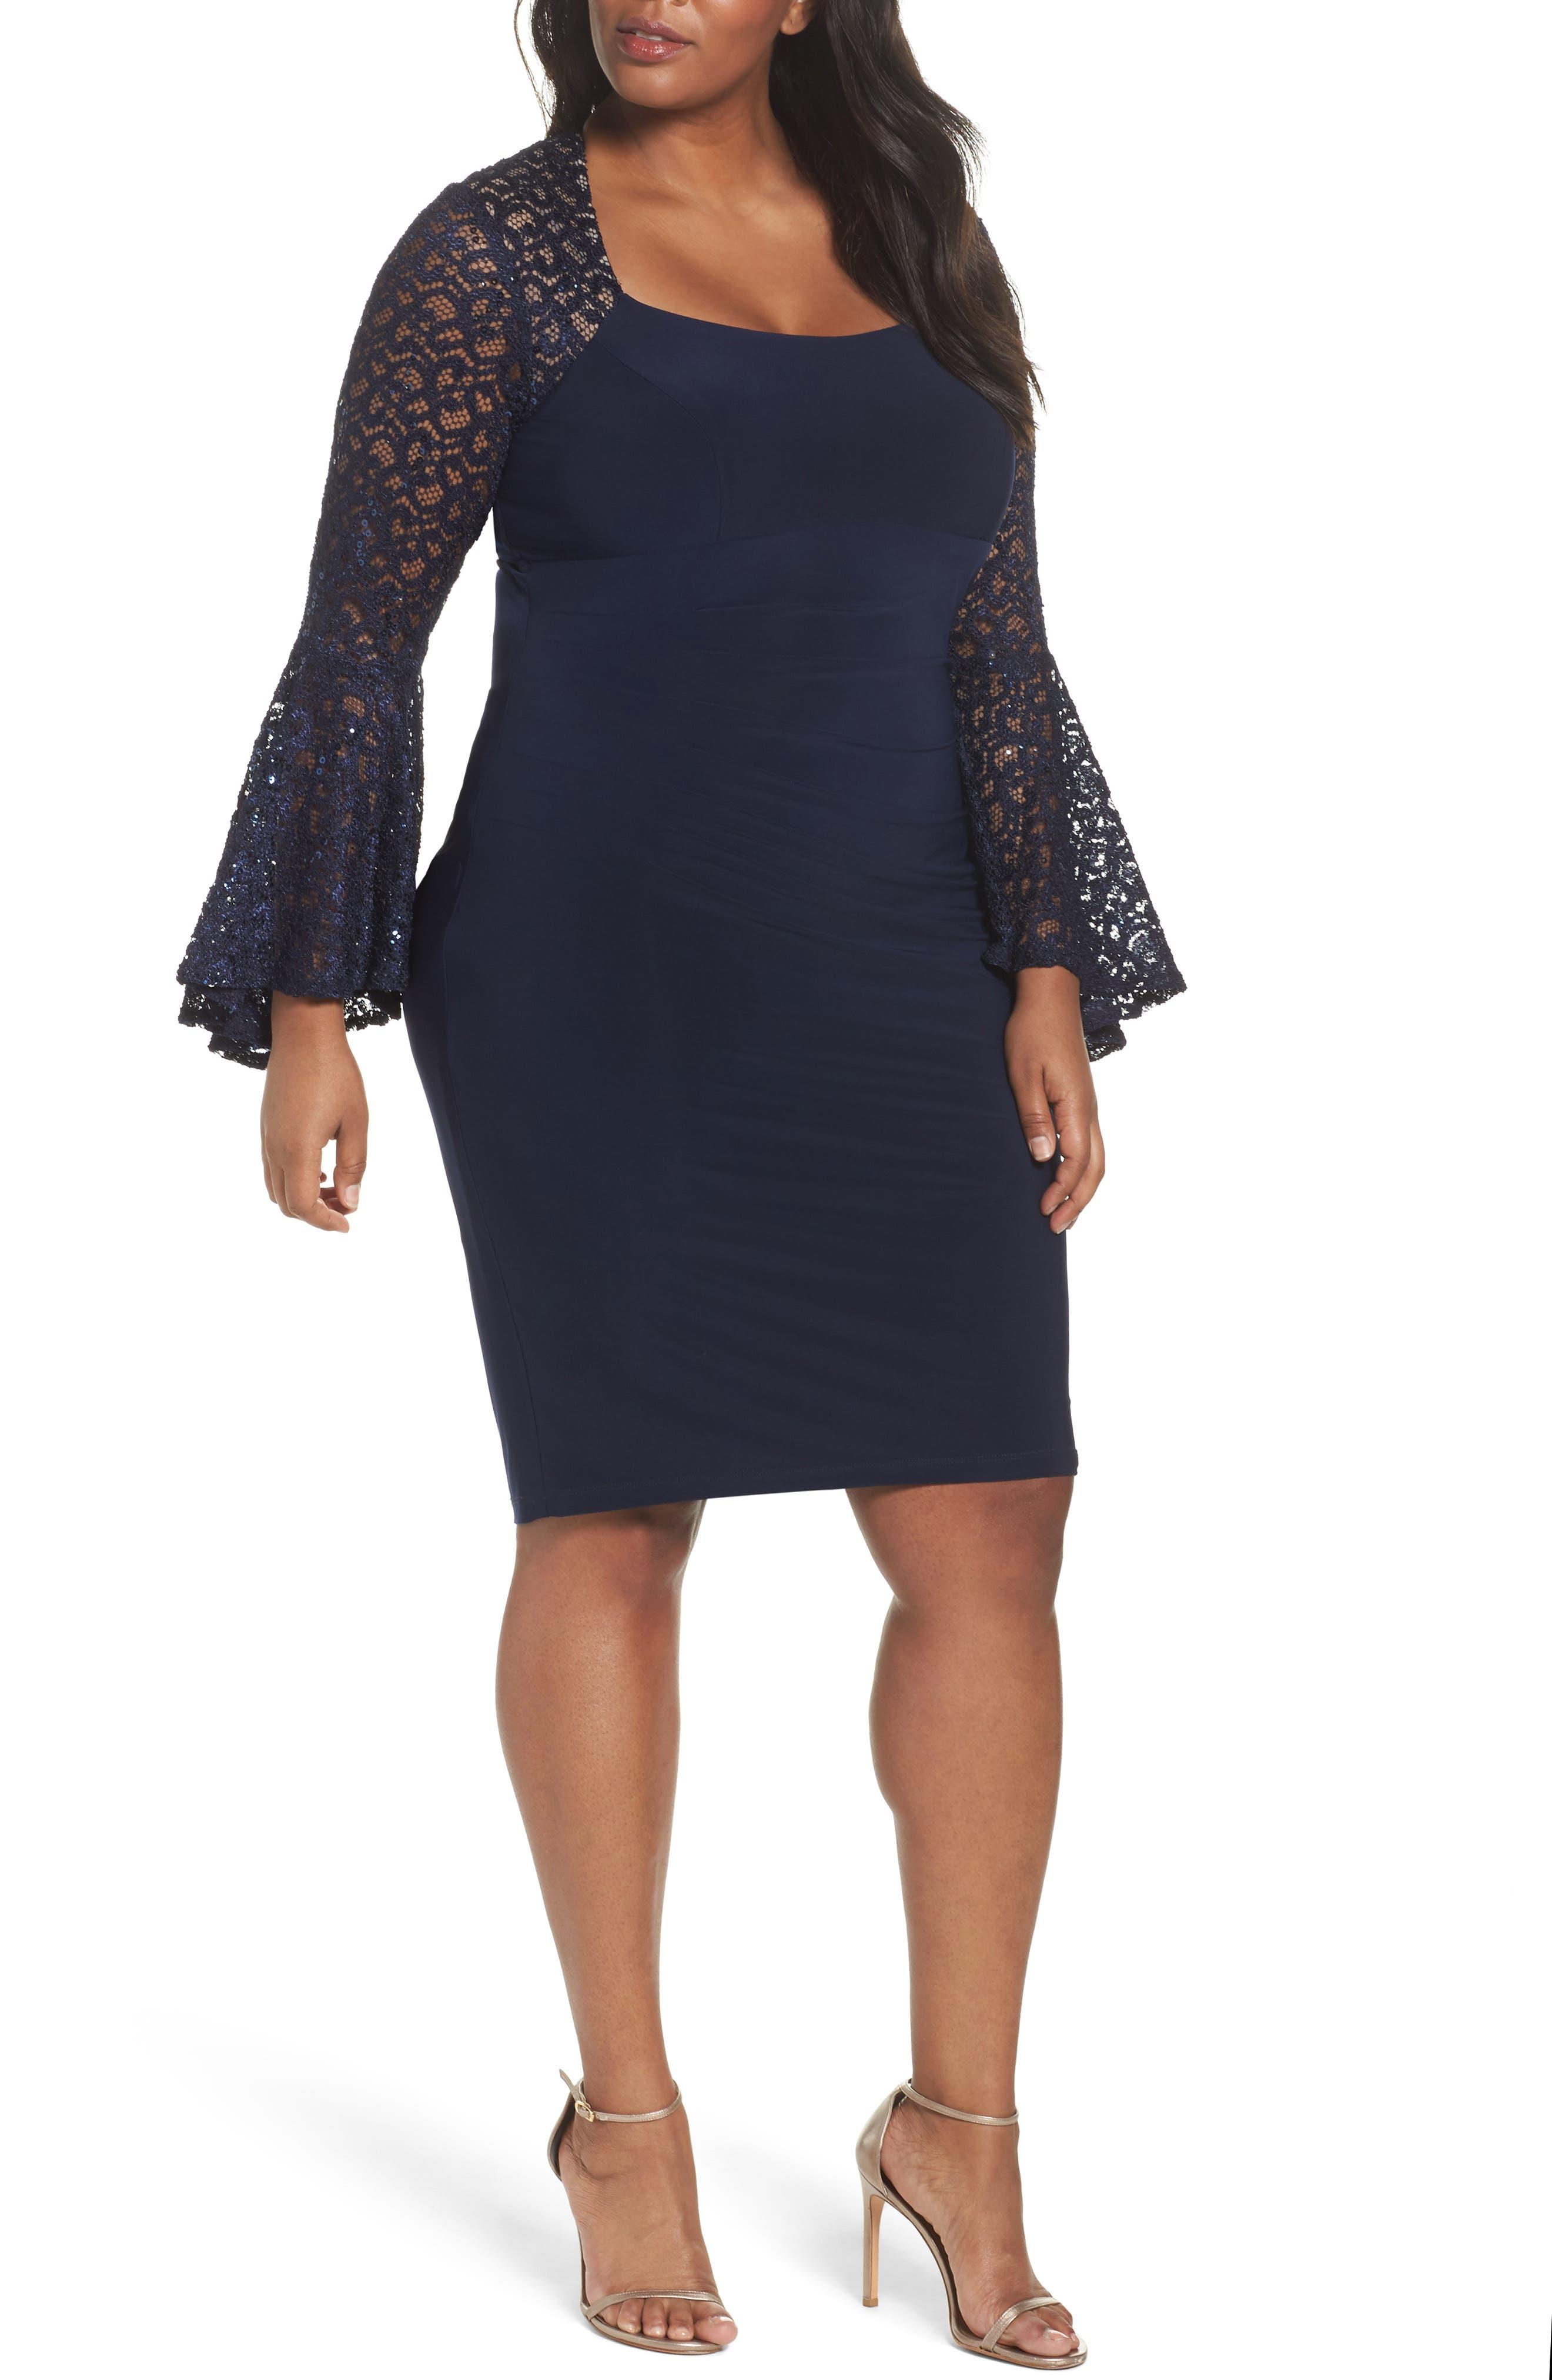 Alternate Image 1 Selected - Xscape Ruched Lace Sleeve Sheath Dress (Plus Size)